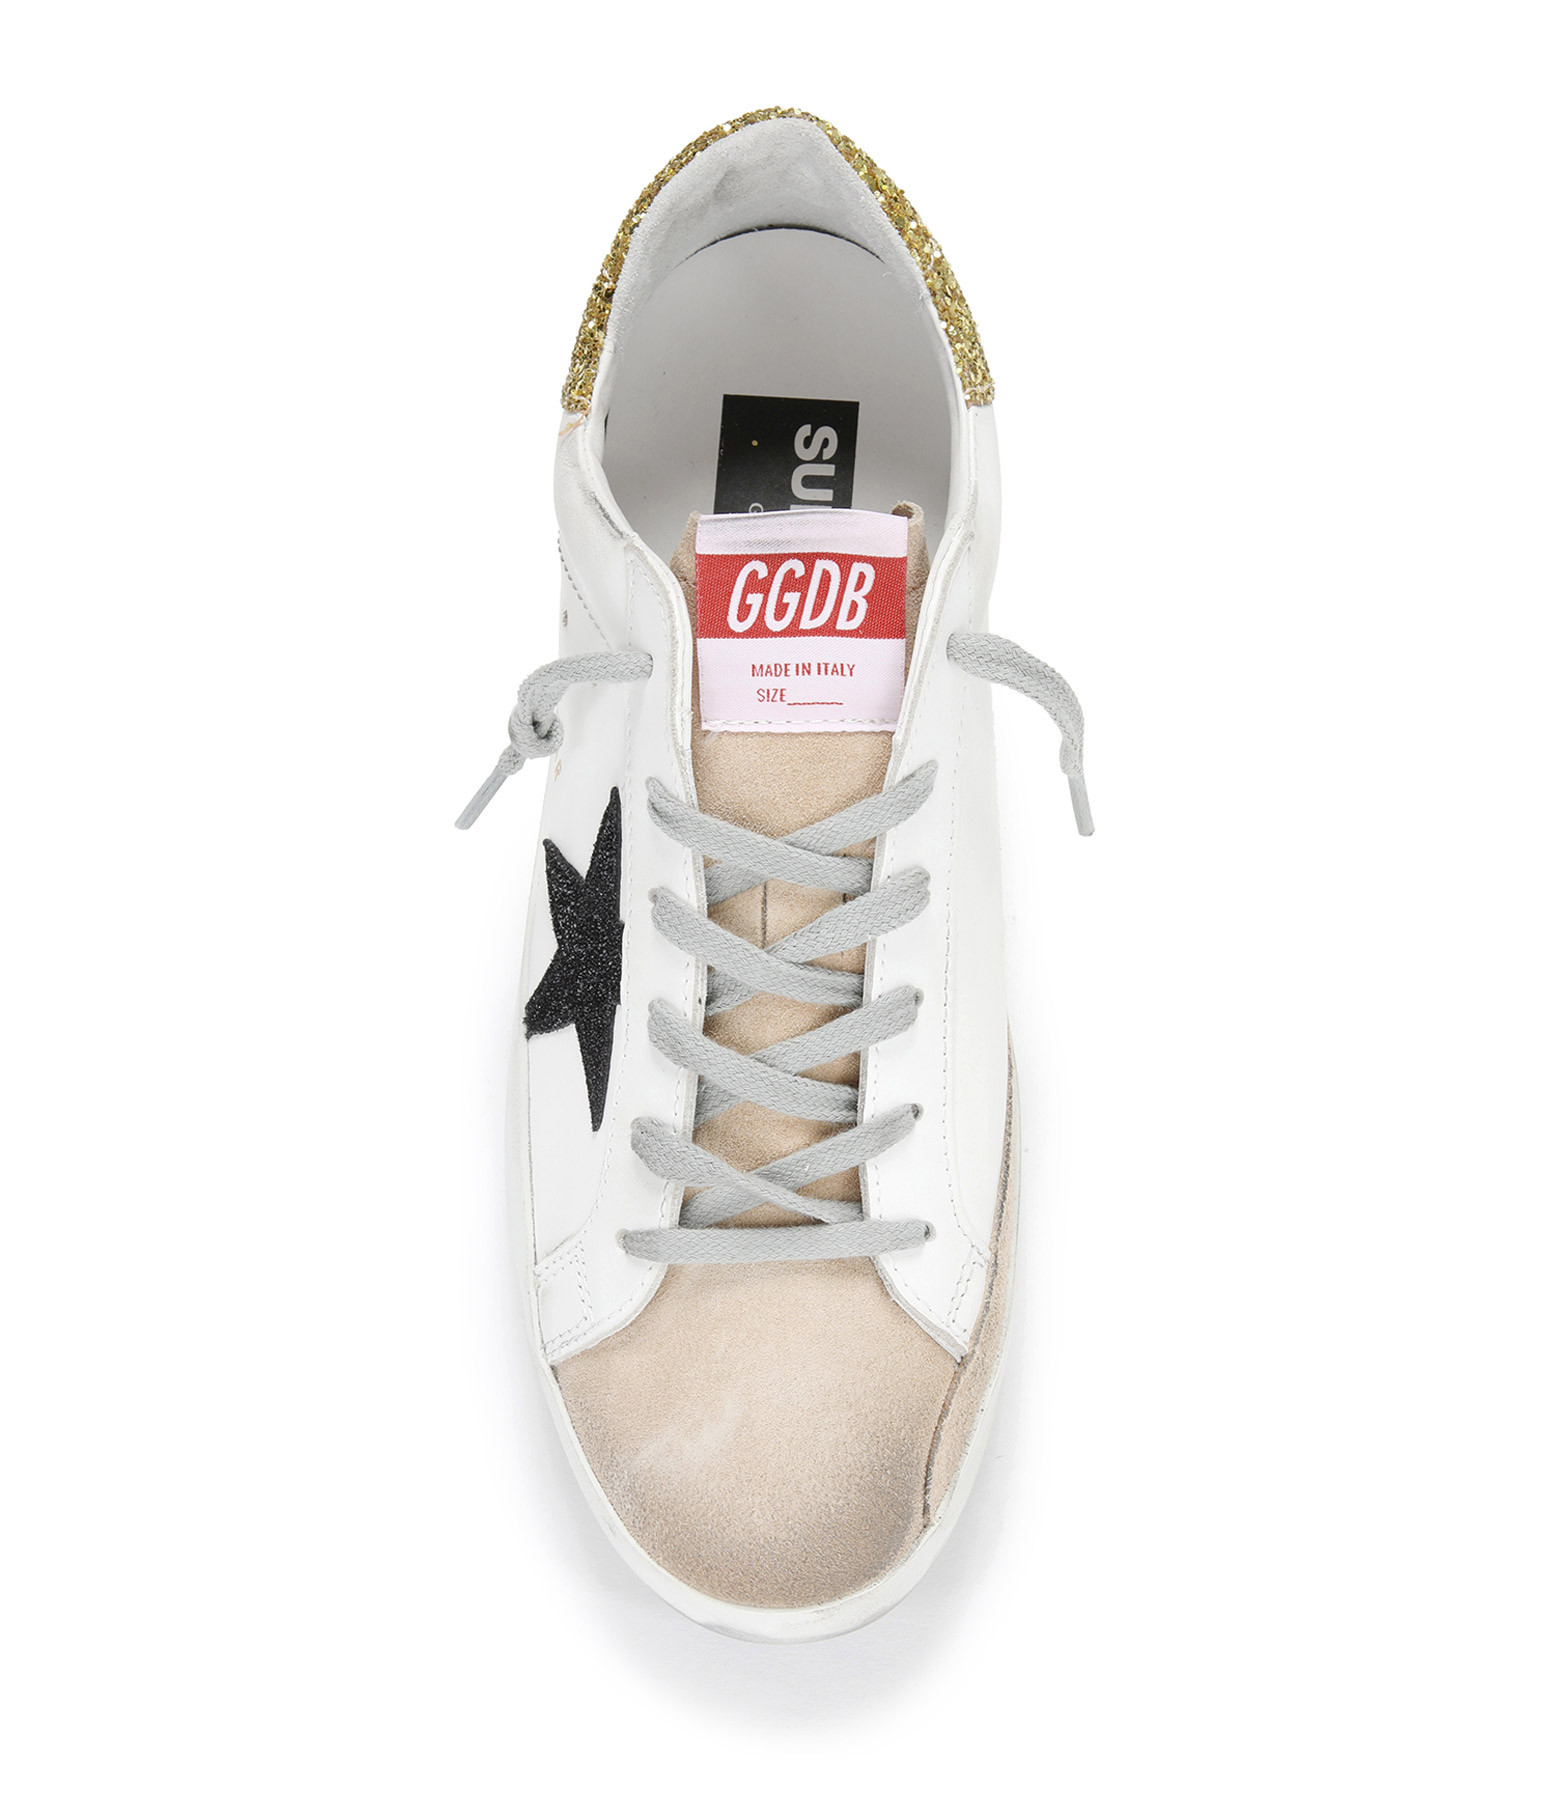 GOLDEN GOOSE - Baskets Superstar Cuir Suédé Cappucino Blanc